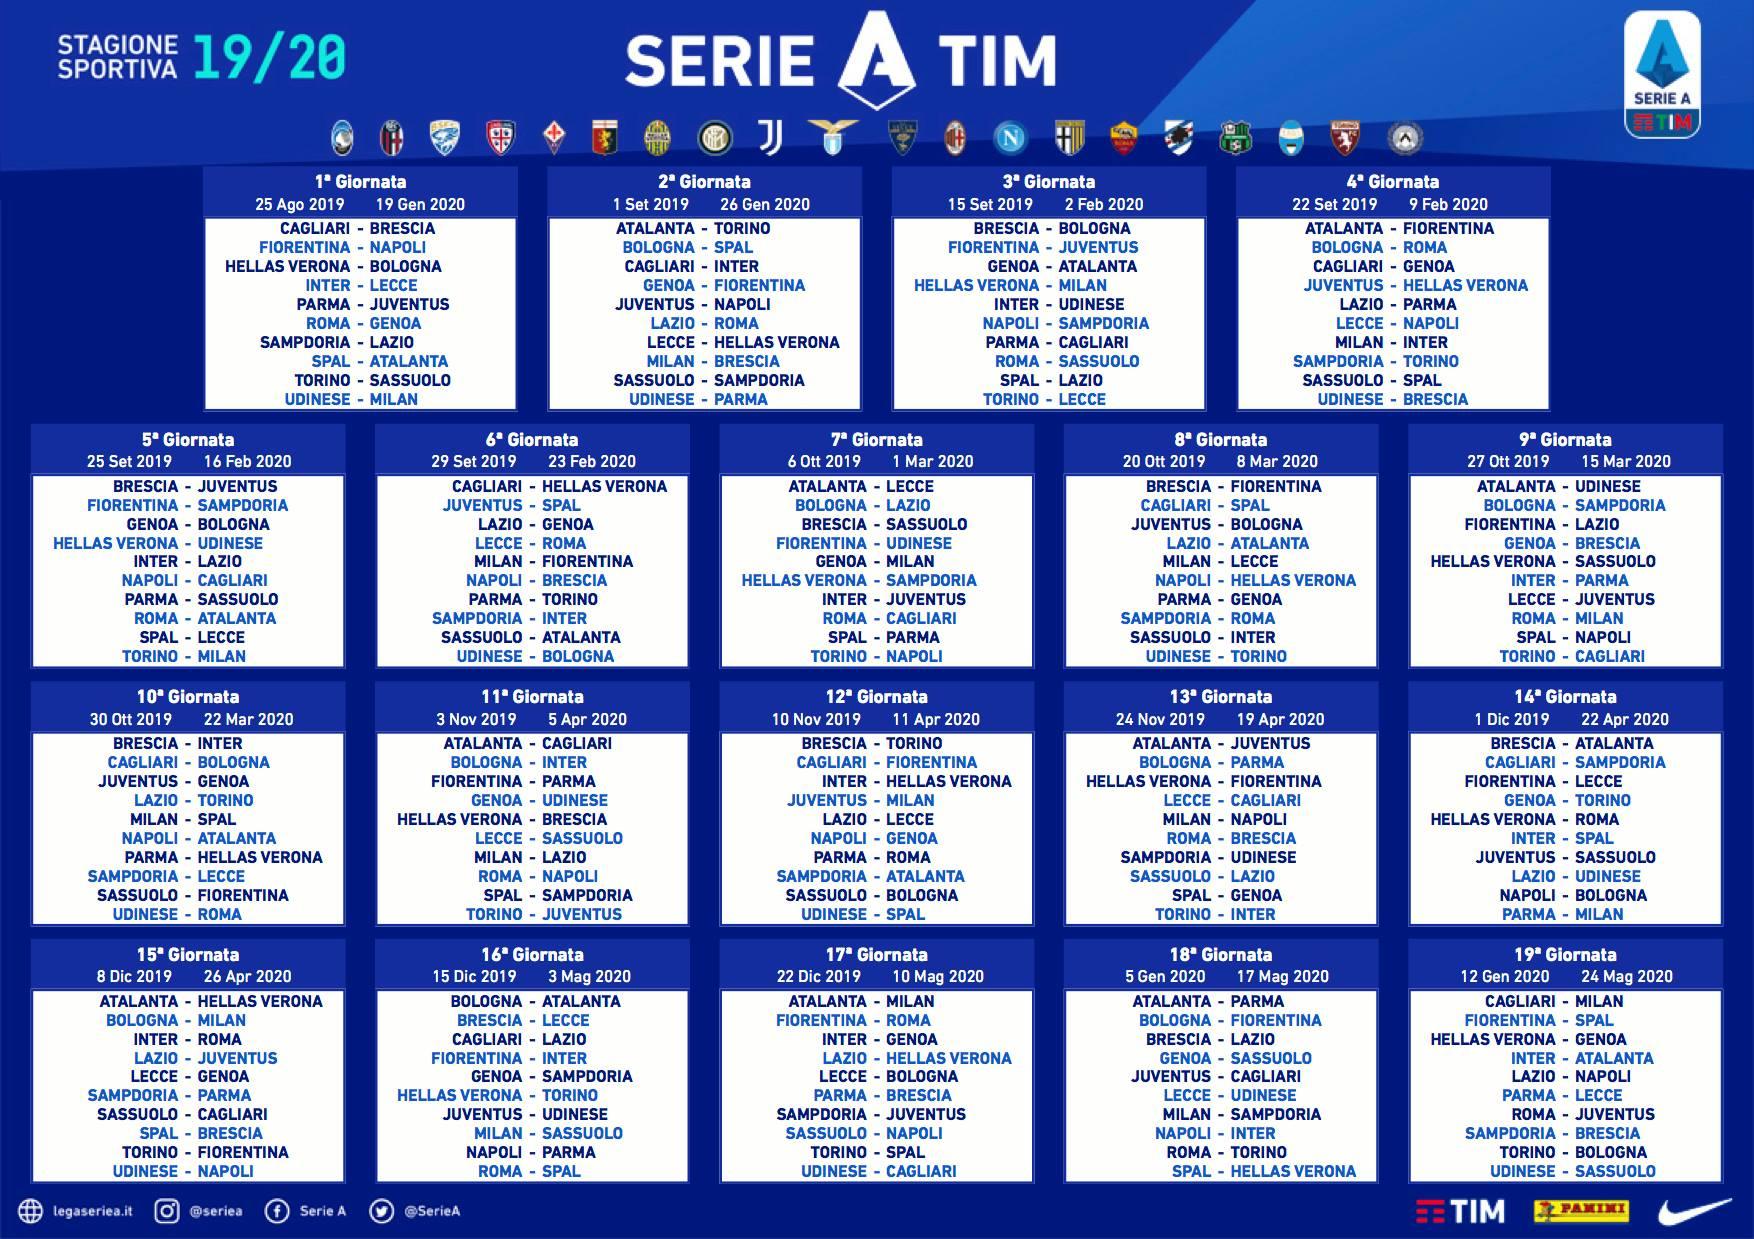 Calendario Religioso 2020.Calendario Serie A Tim 2019 2020 Le Notizie Di Genova E